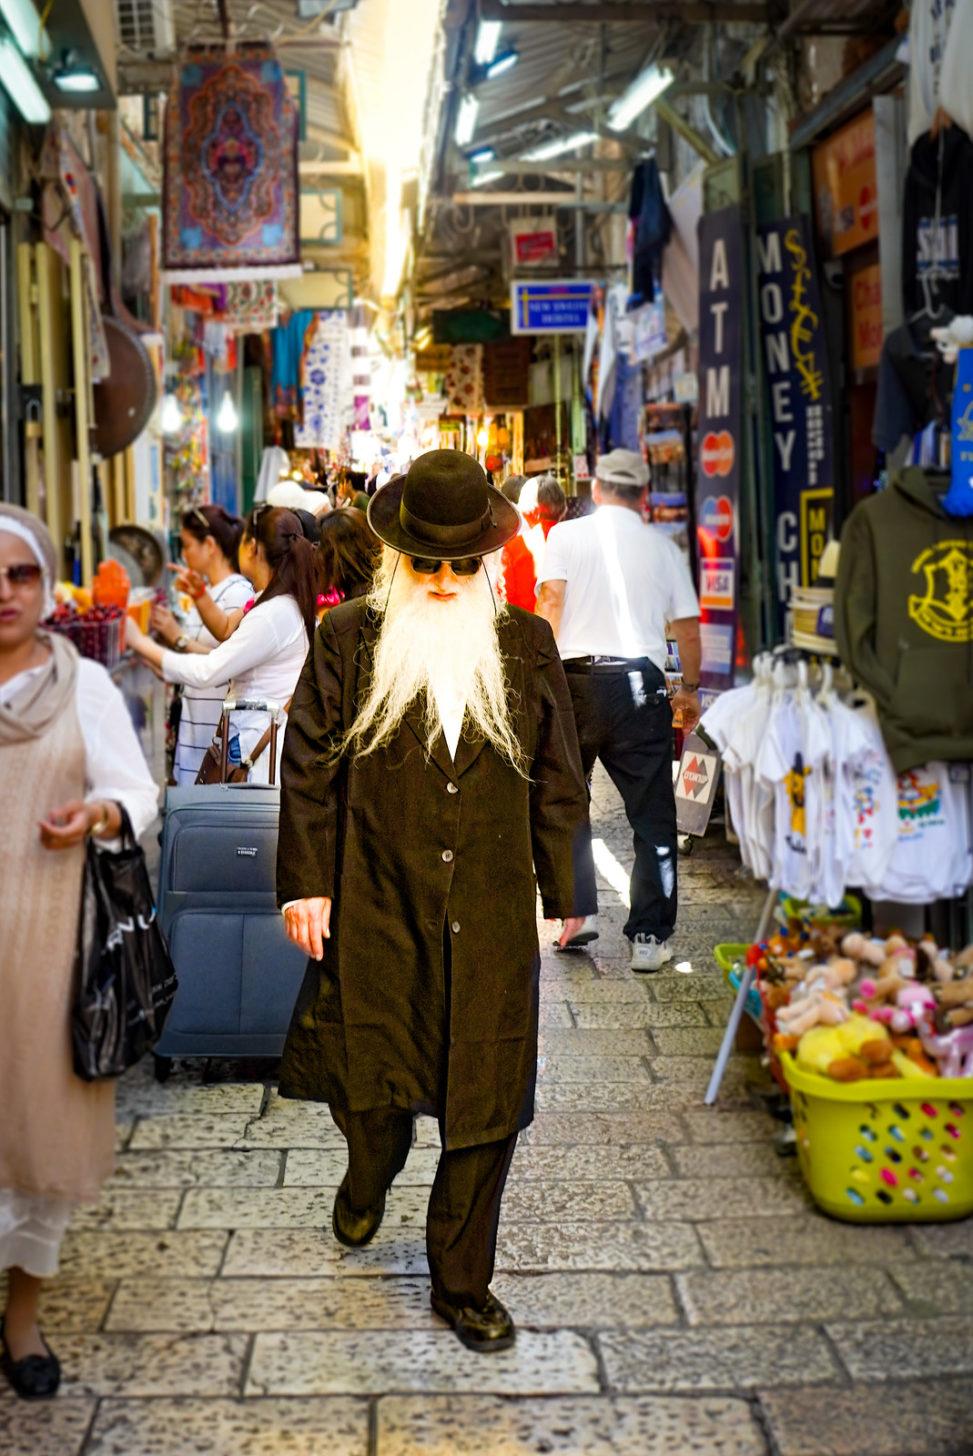 2019.06.16 Jerusalem and Tel Aviv People and Places, Israel 1670017